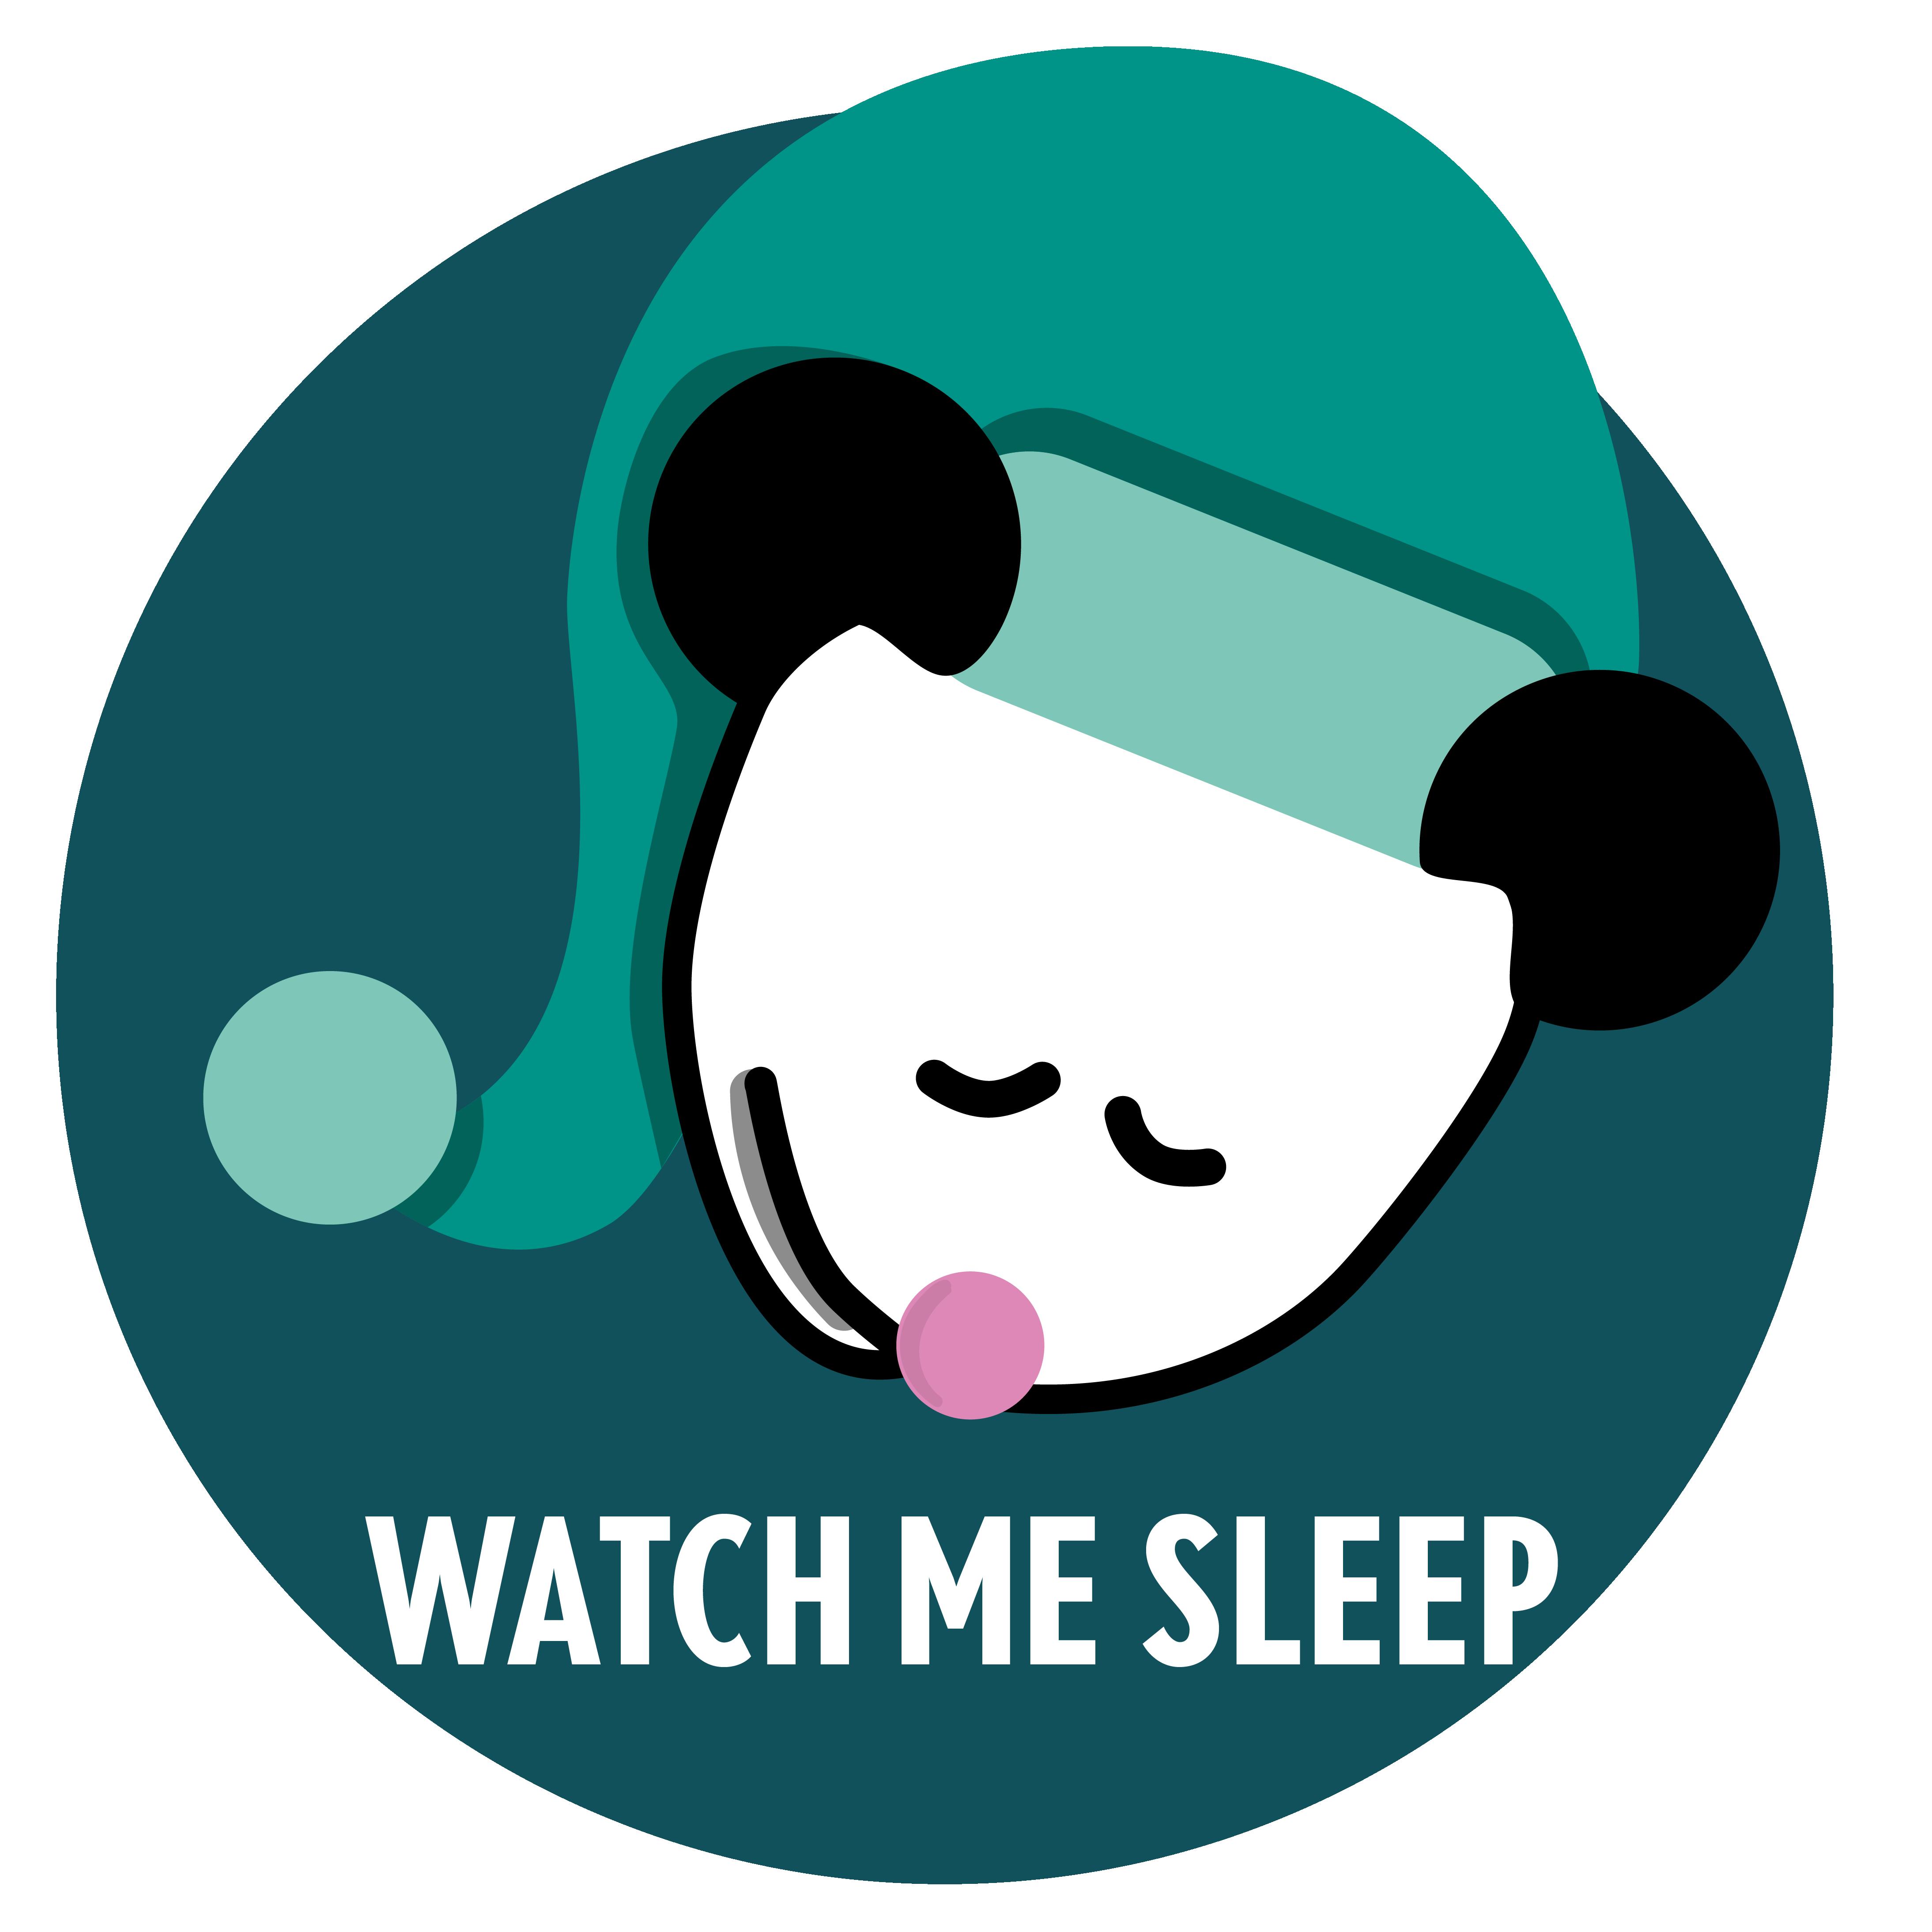 Baby Petunia messages sticker-5